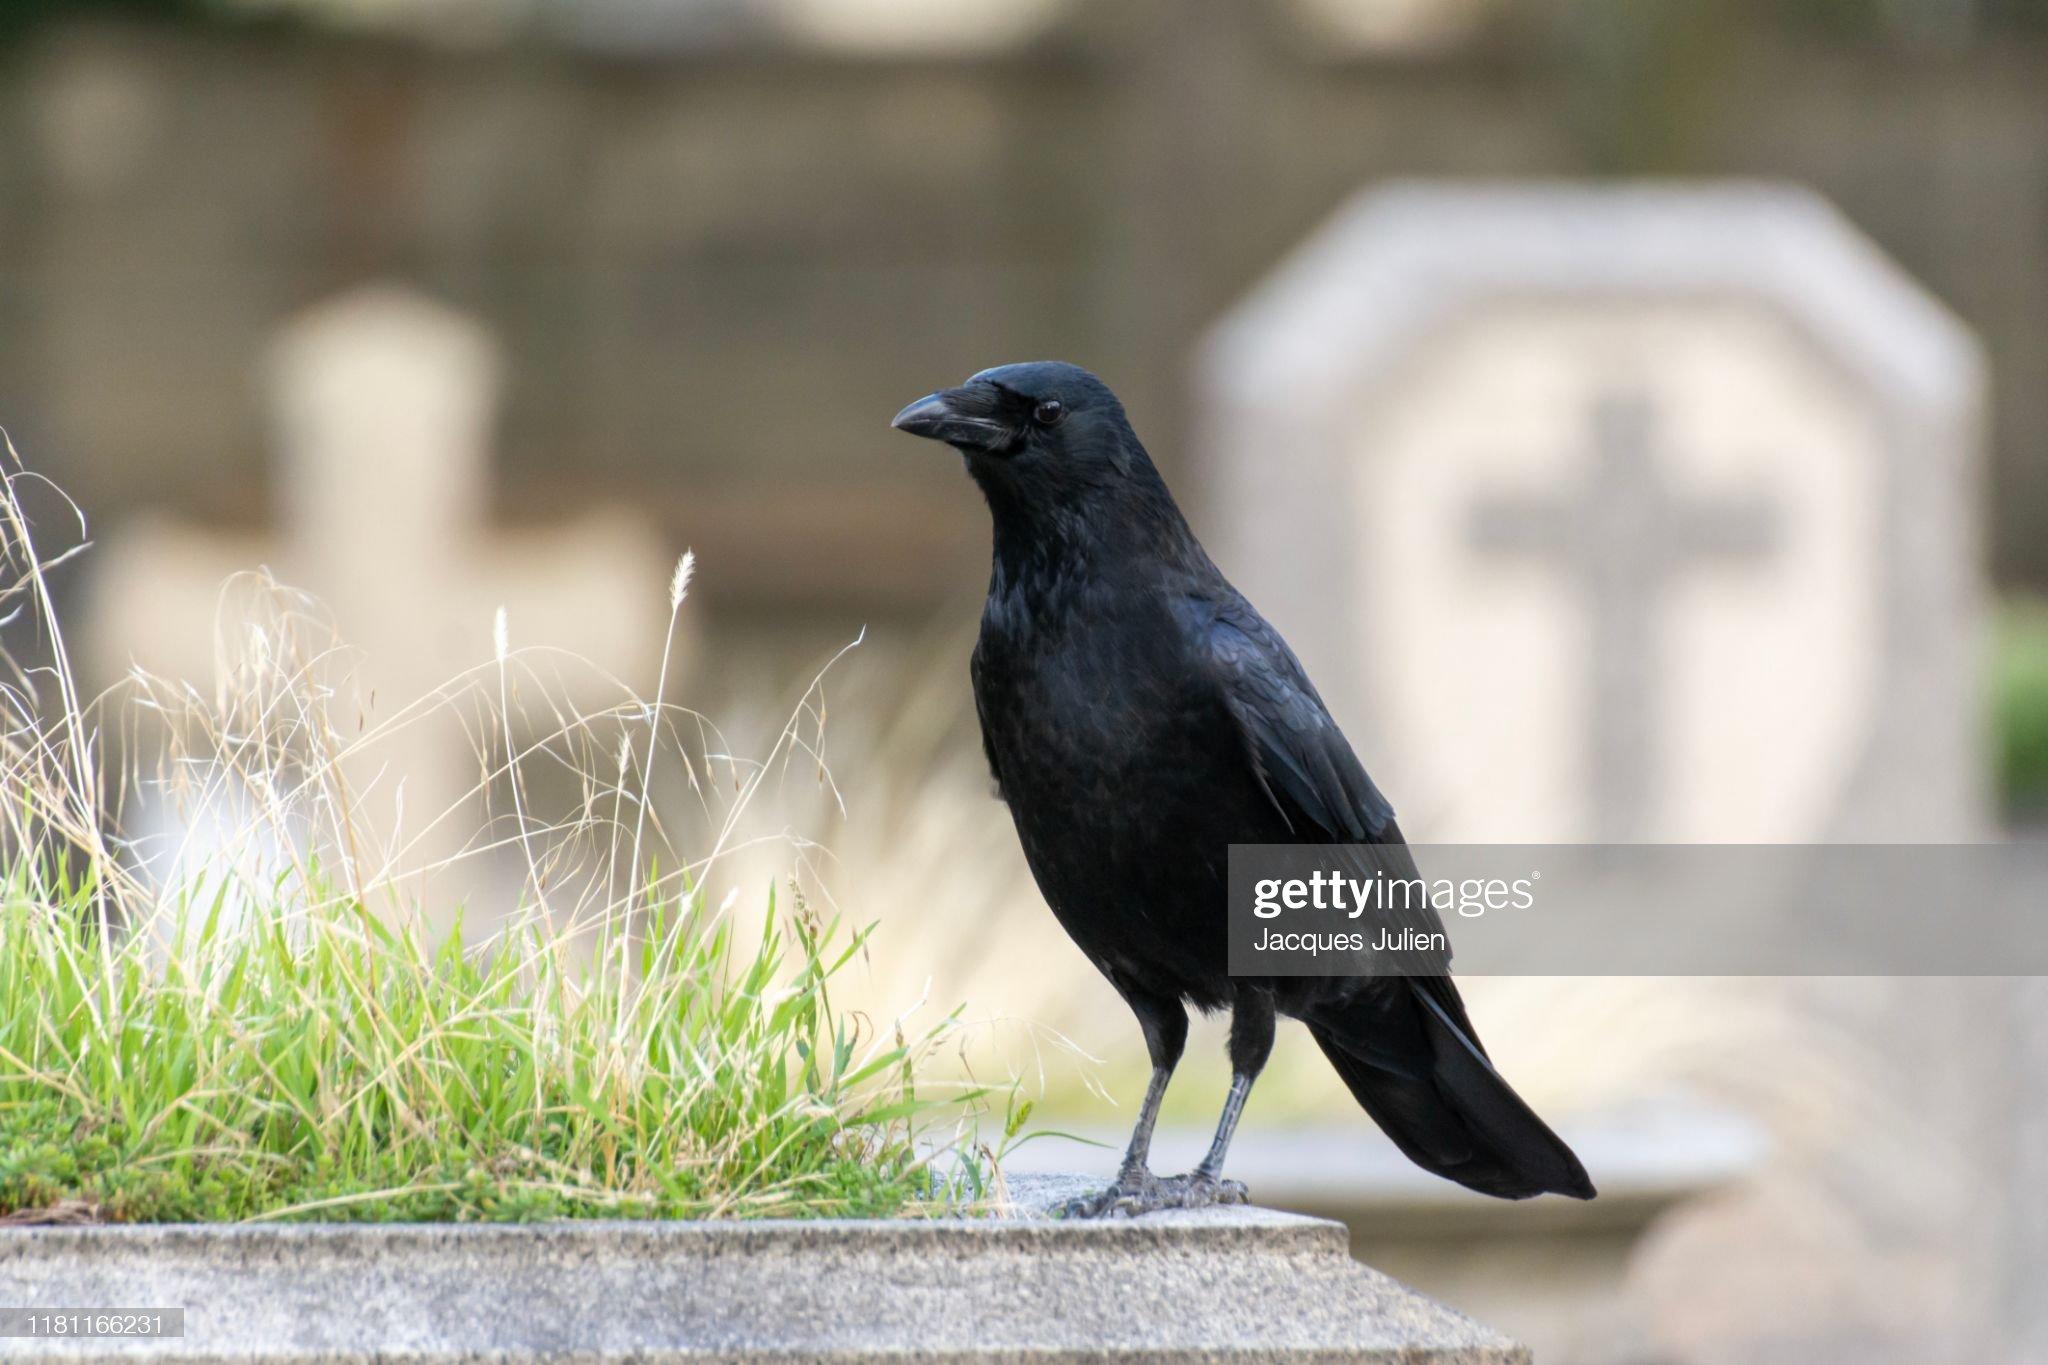 Crow - black bird - in a cemetery (Père-Lachaise, Paris) : Photo